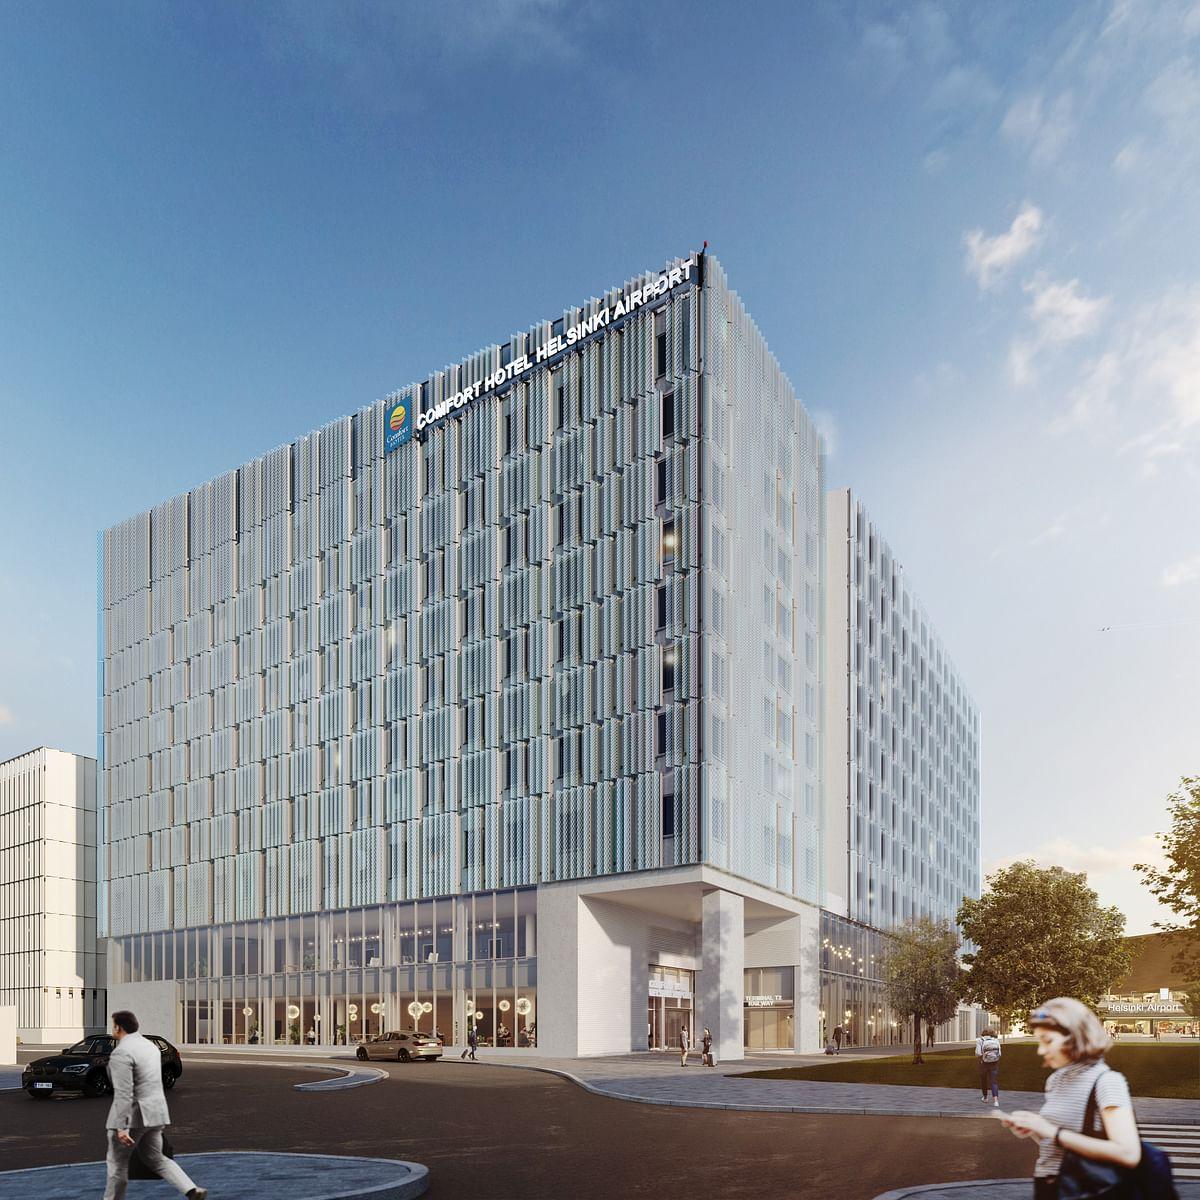 Skanska to Build Hotel in Helsinki Airport in Finland